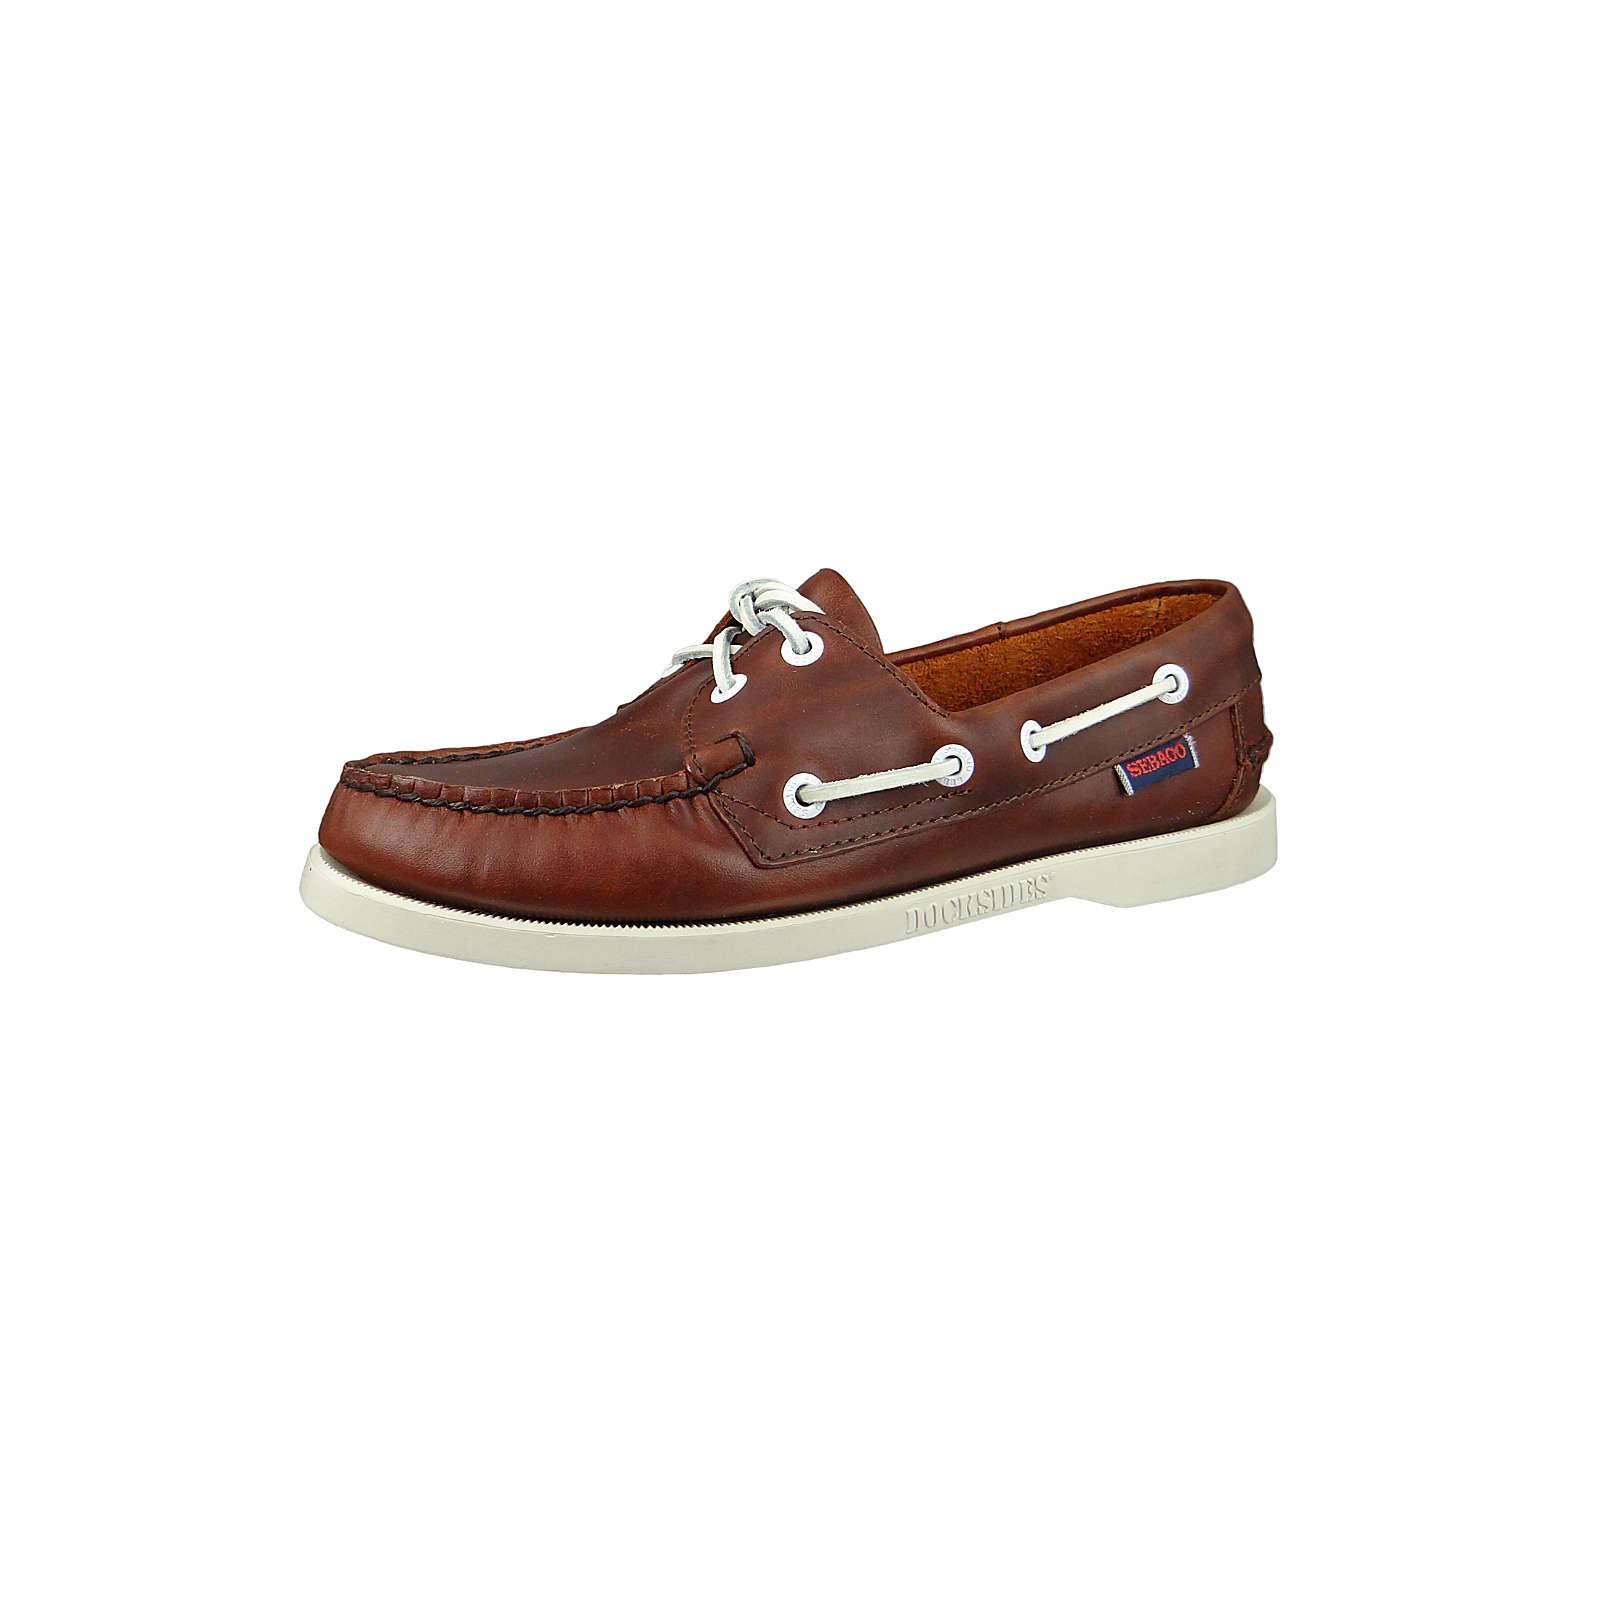 SEBAGO Damen Schuhe B500247 Docksides Brown Braun Segelschuhe braun Damen Gr. 38